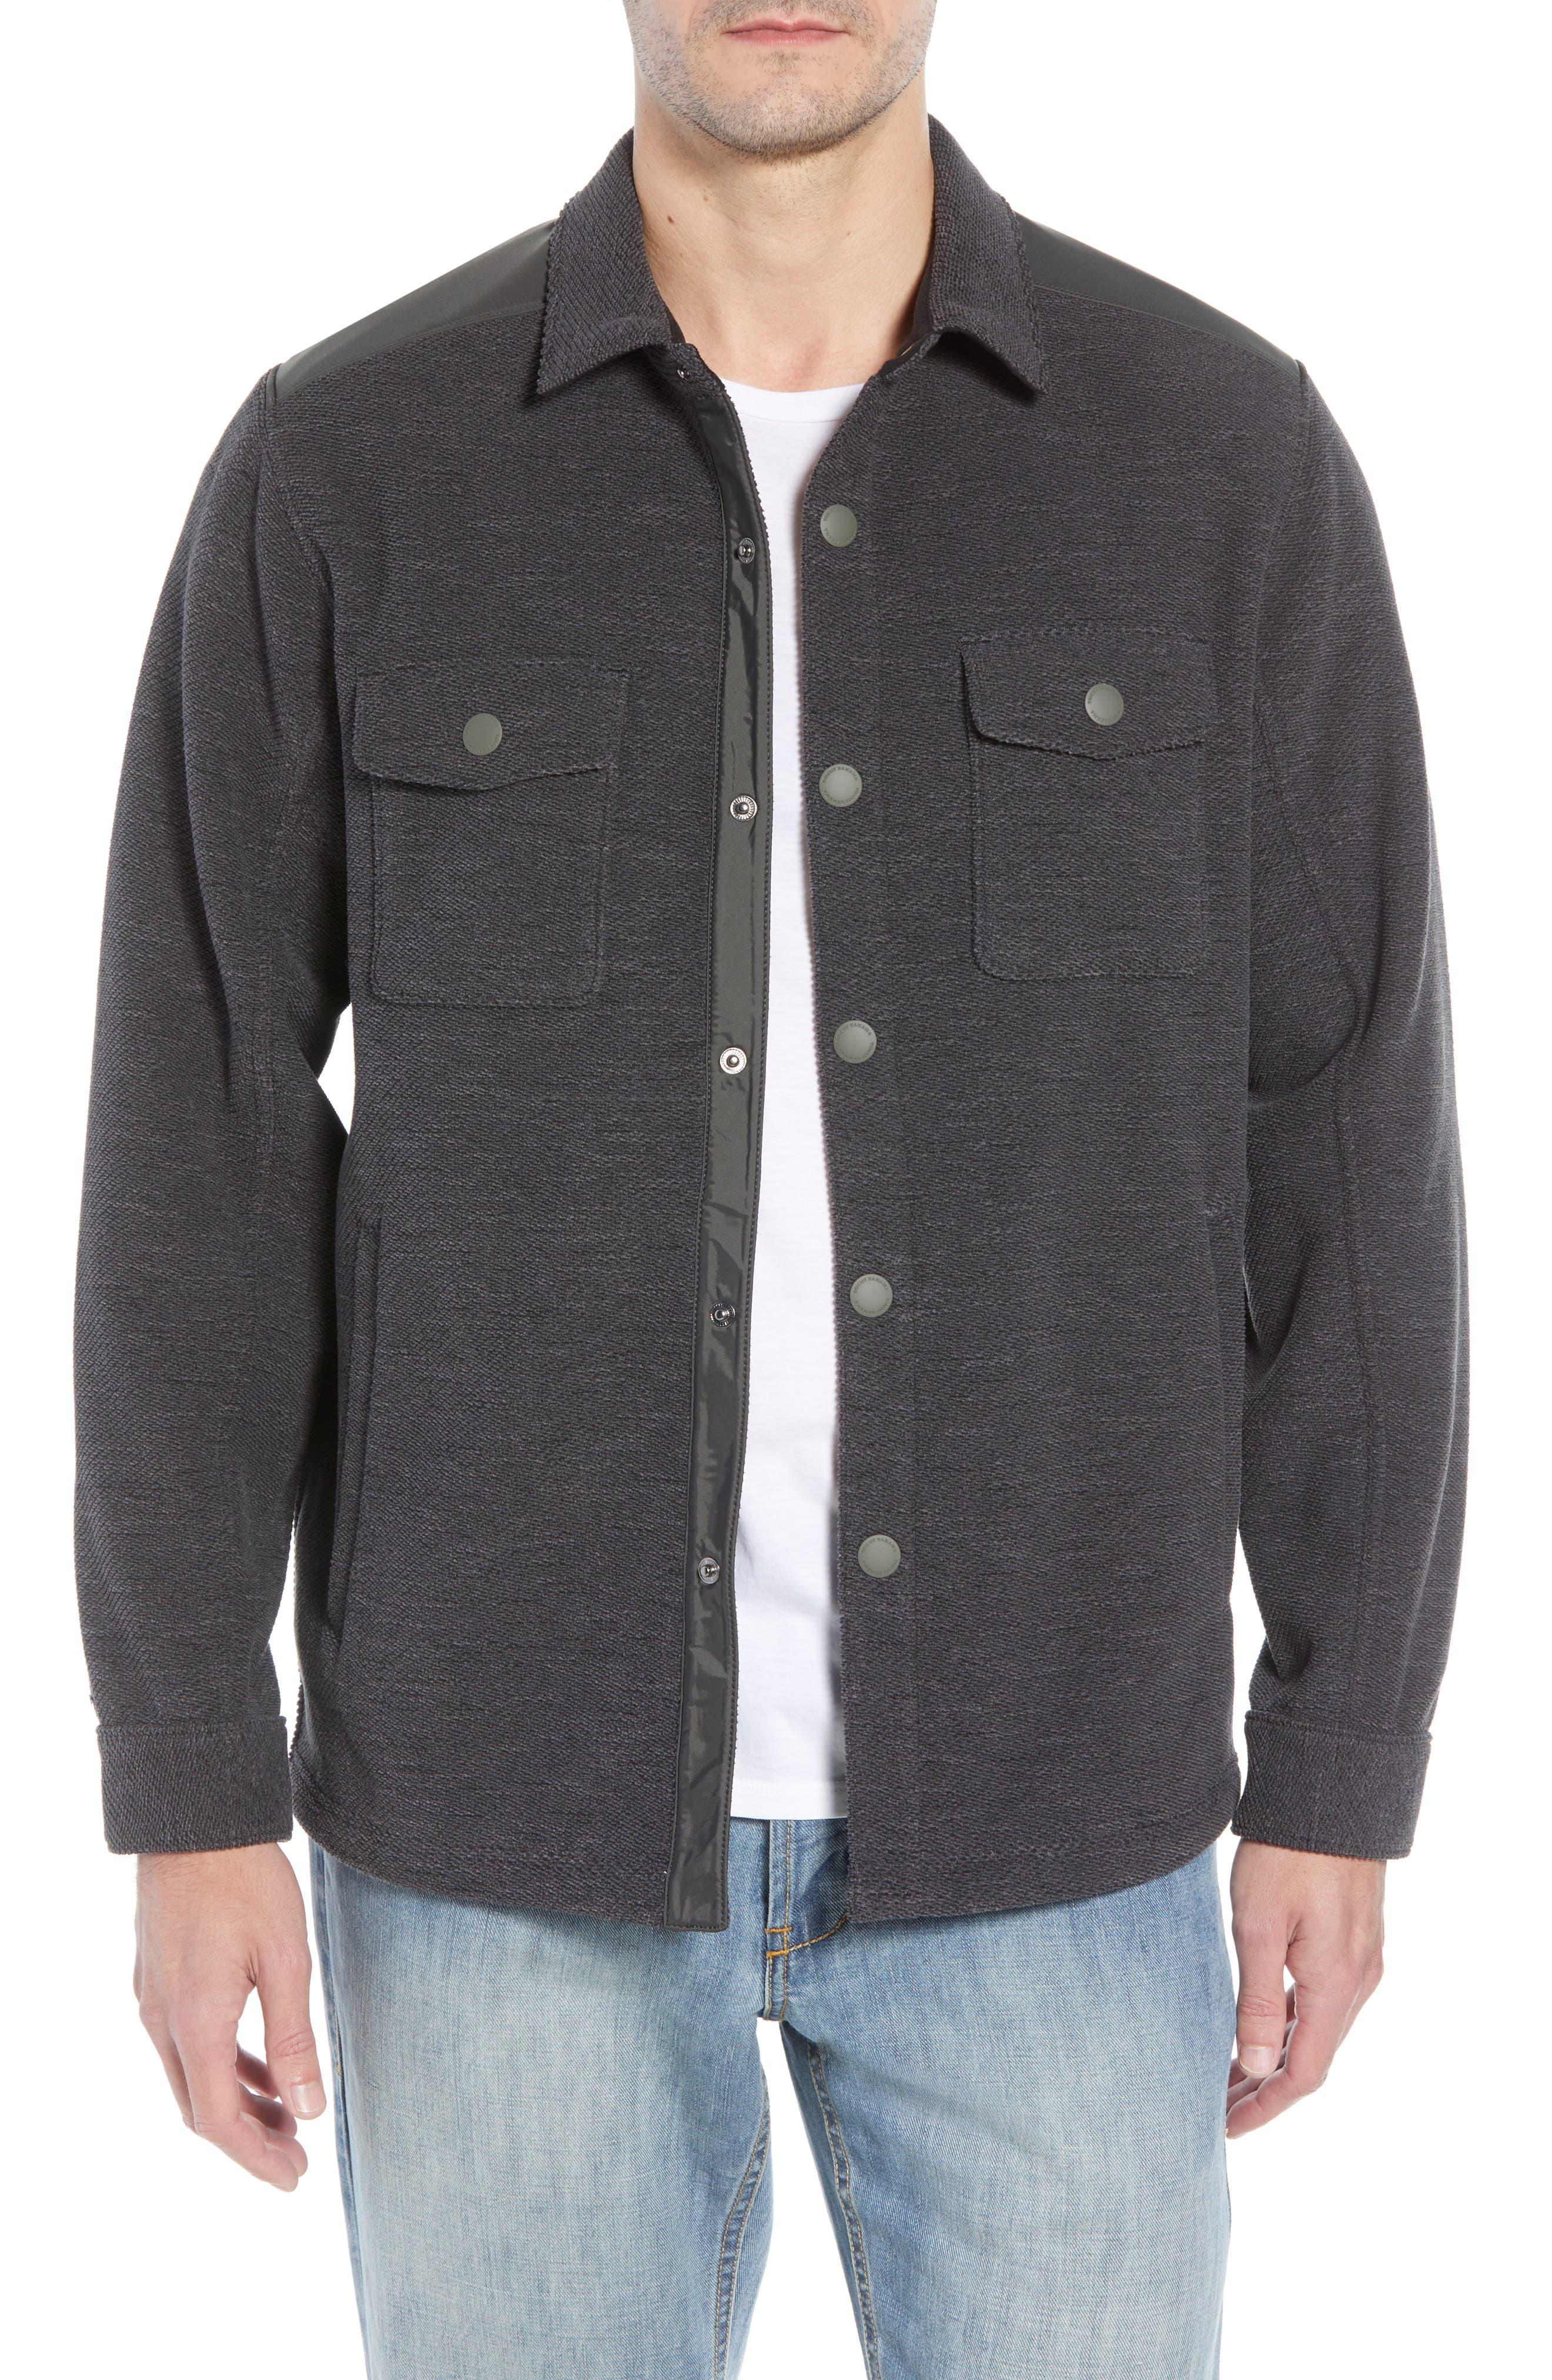 San Pablo CPO Regular Fit Jacket,                         Main,                         color, FOG GREY